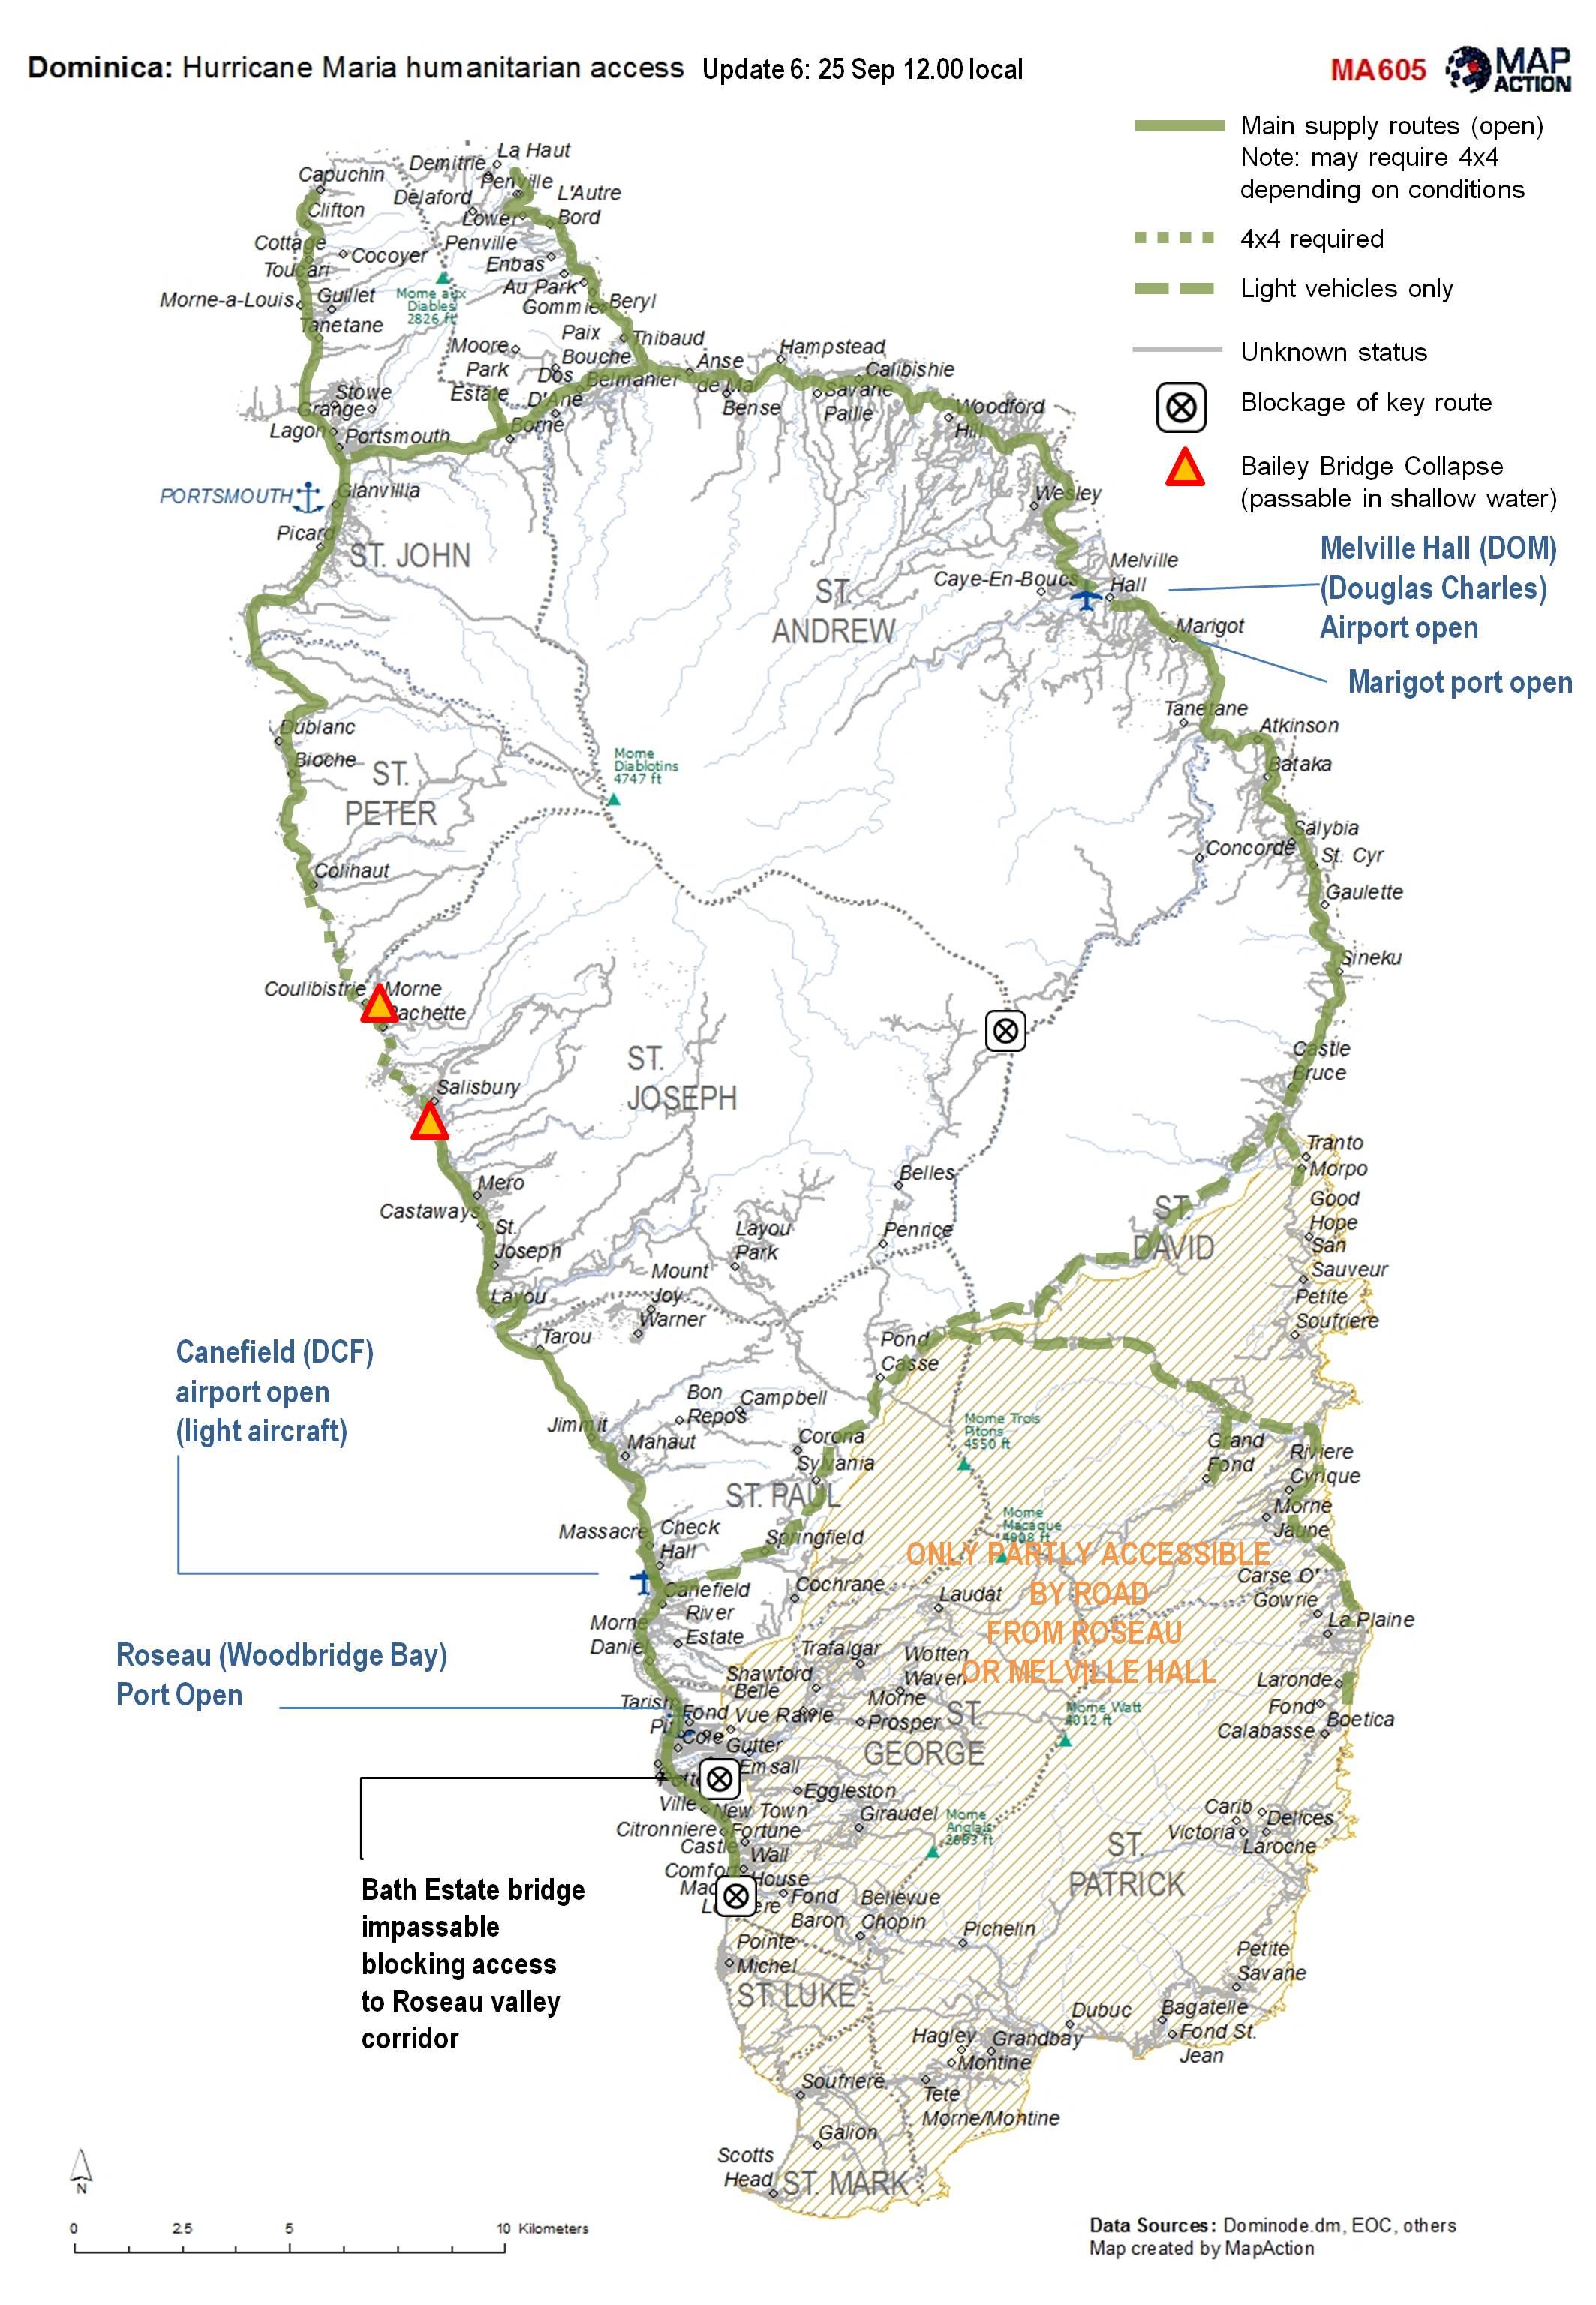 Tropical Storm Maria Caribbean MapAction - Dominica map hd pdf